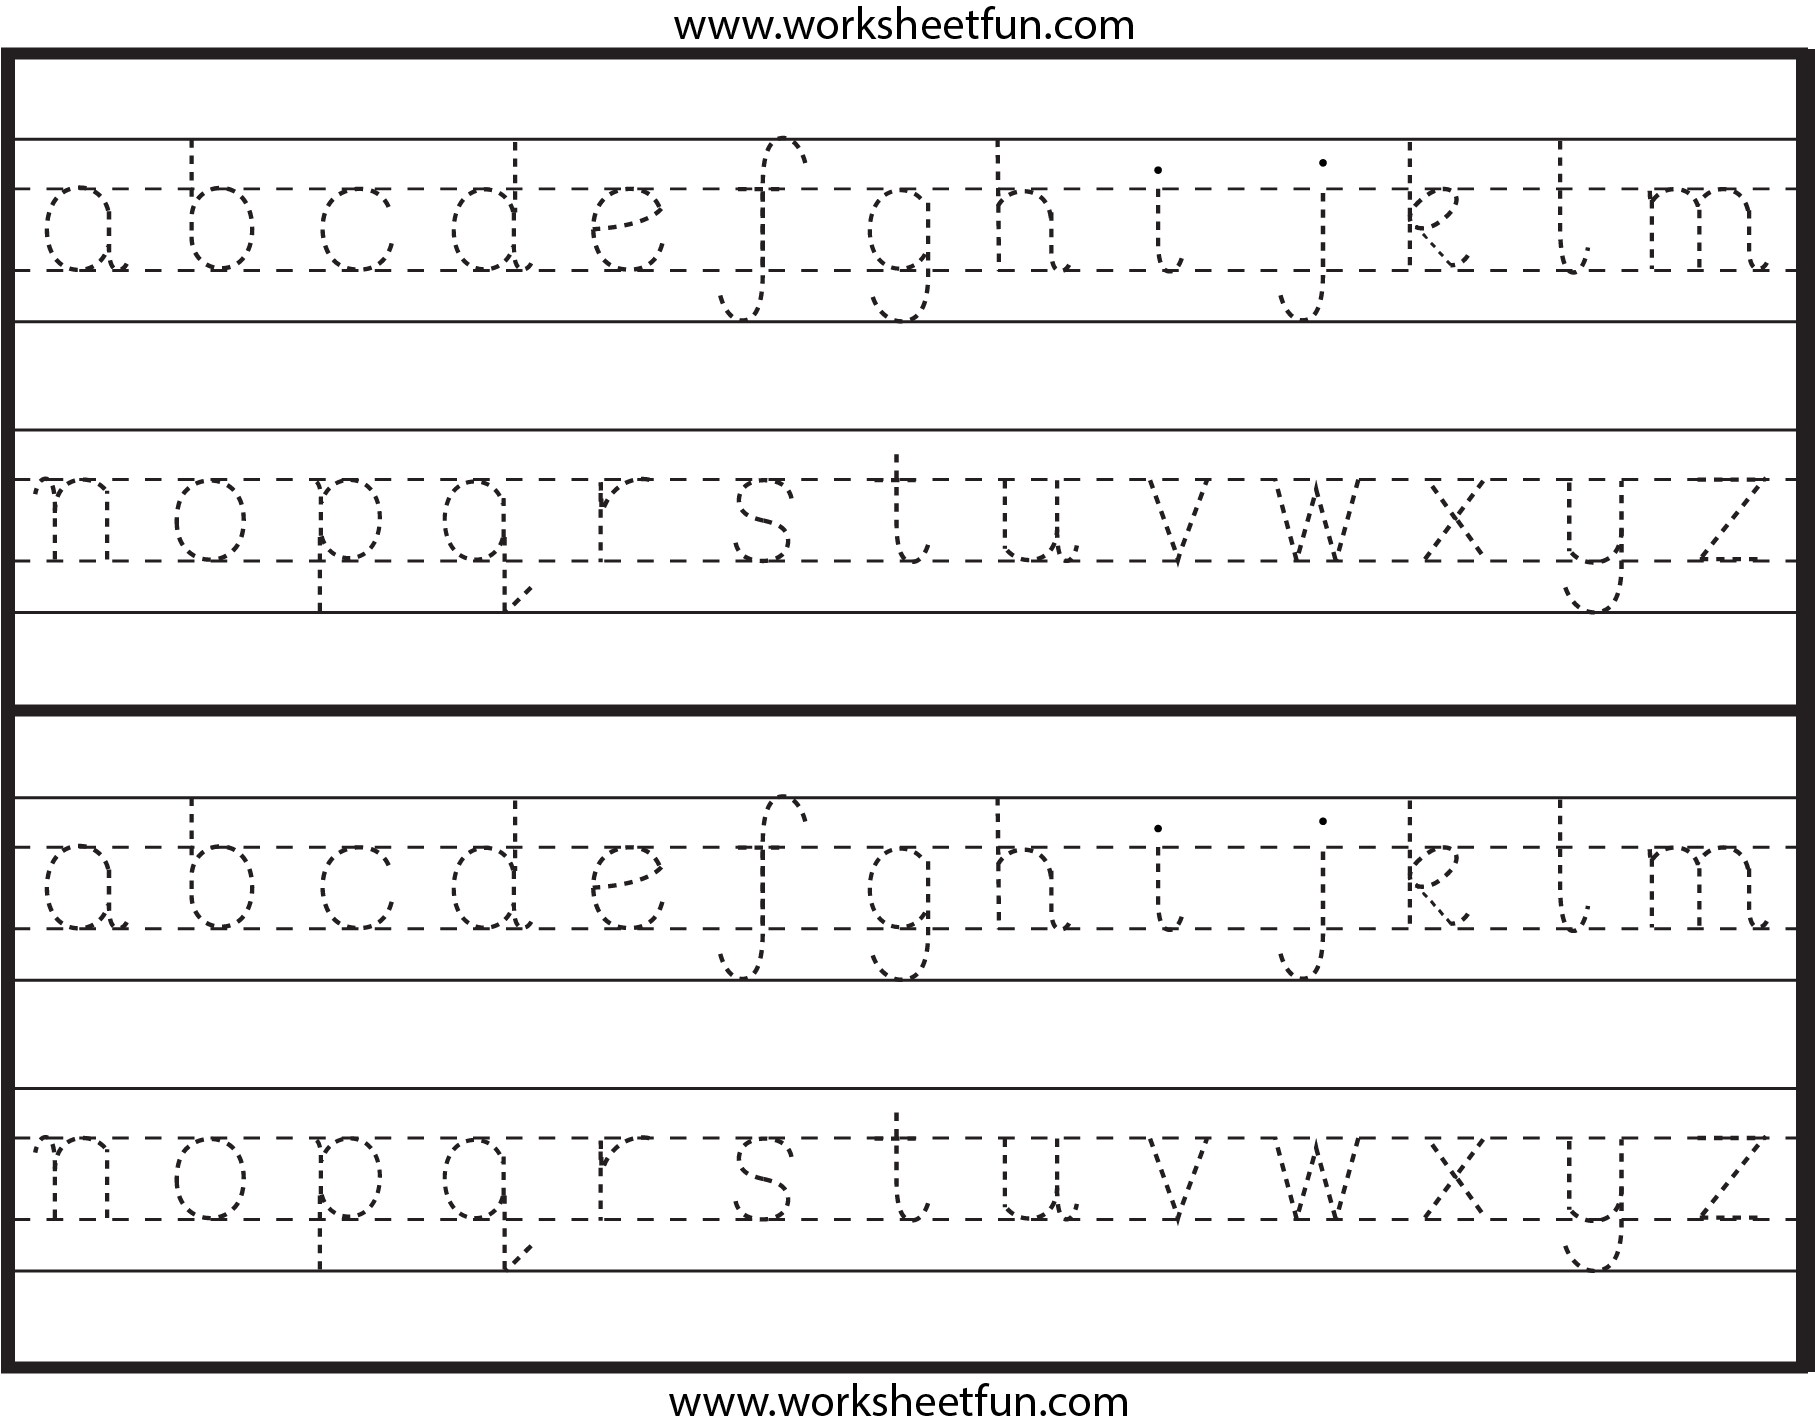 Lowercase Letter Tracing – 1 Worksheet / Free Printable